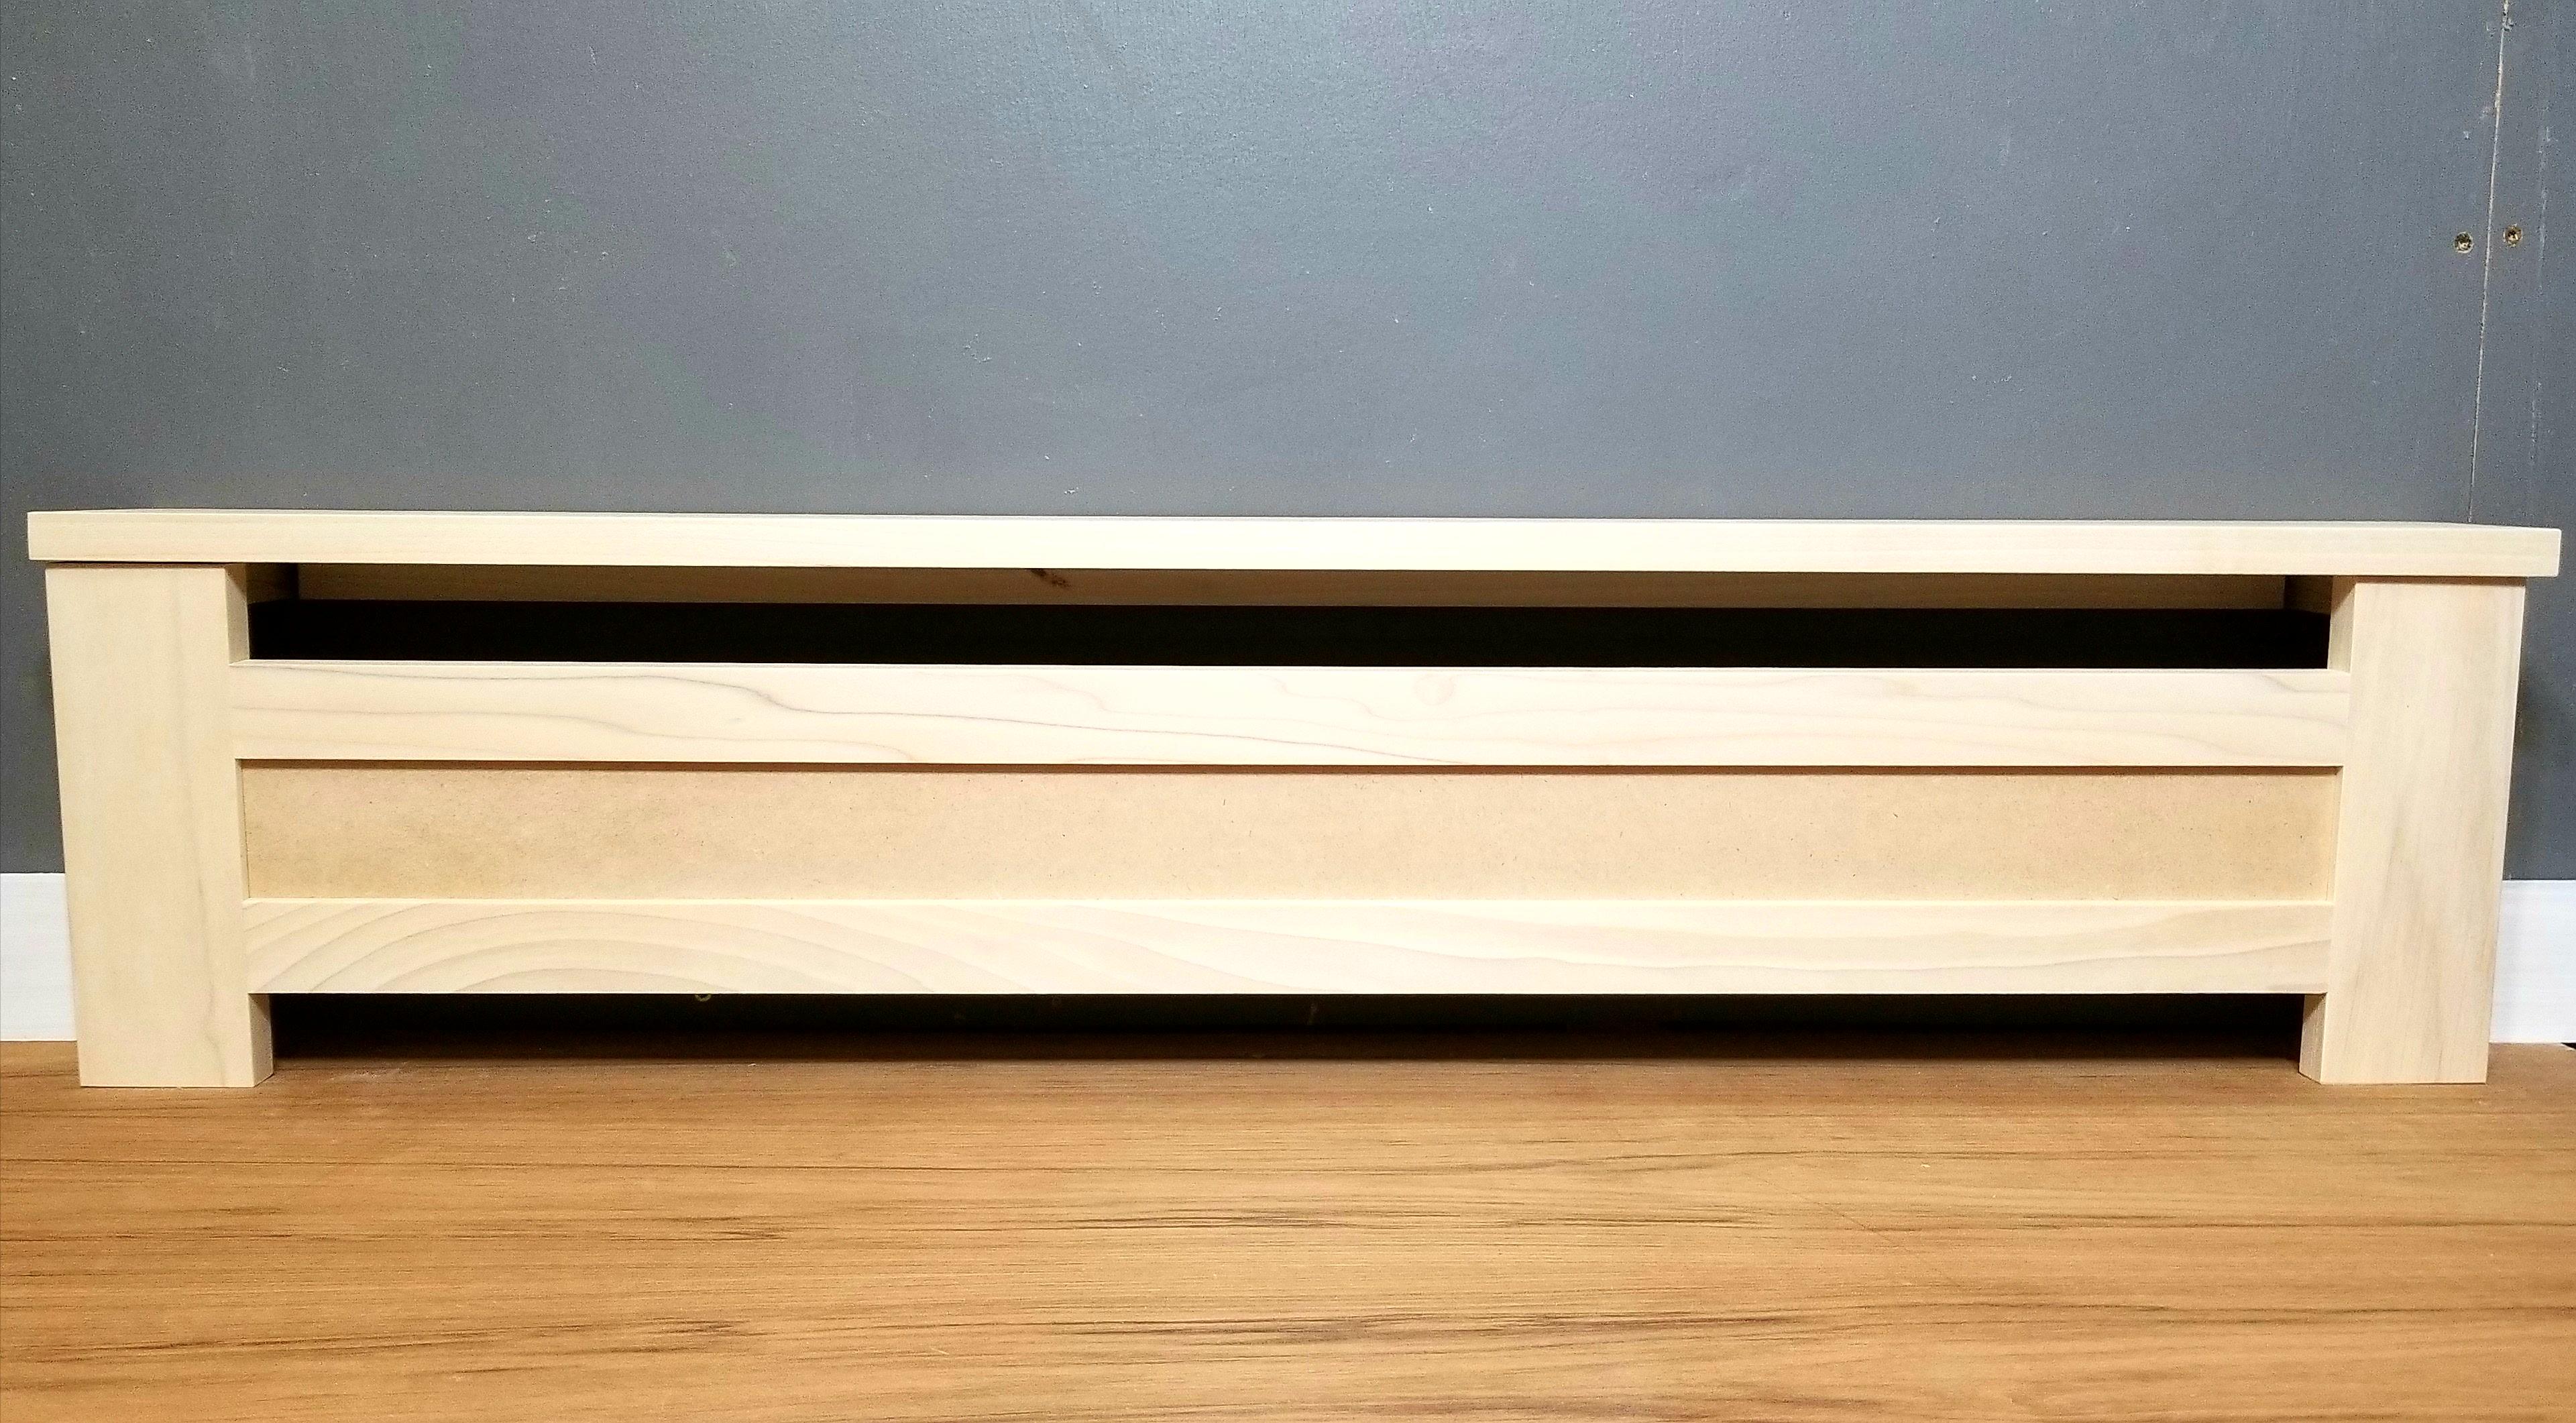 Shaker Baseboard Heater Cover